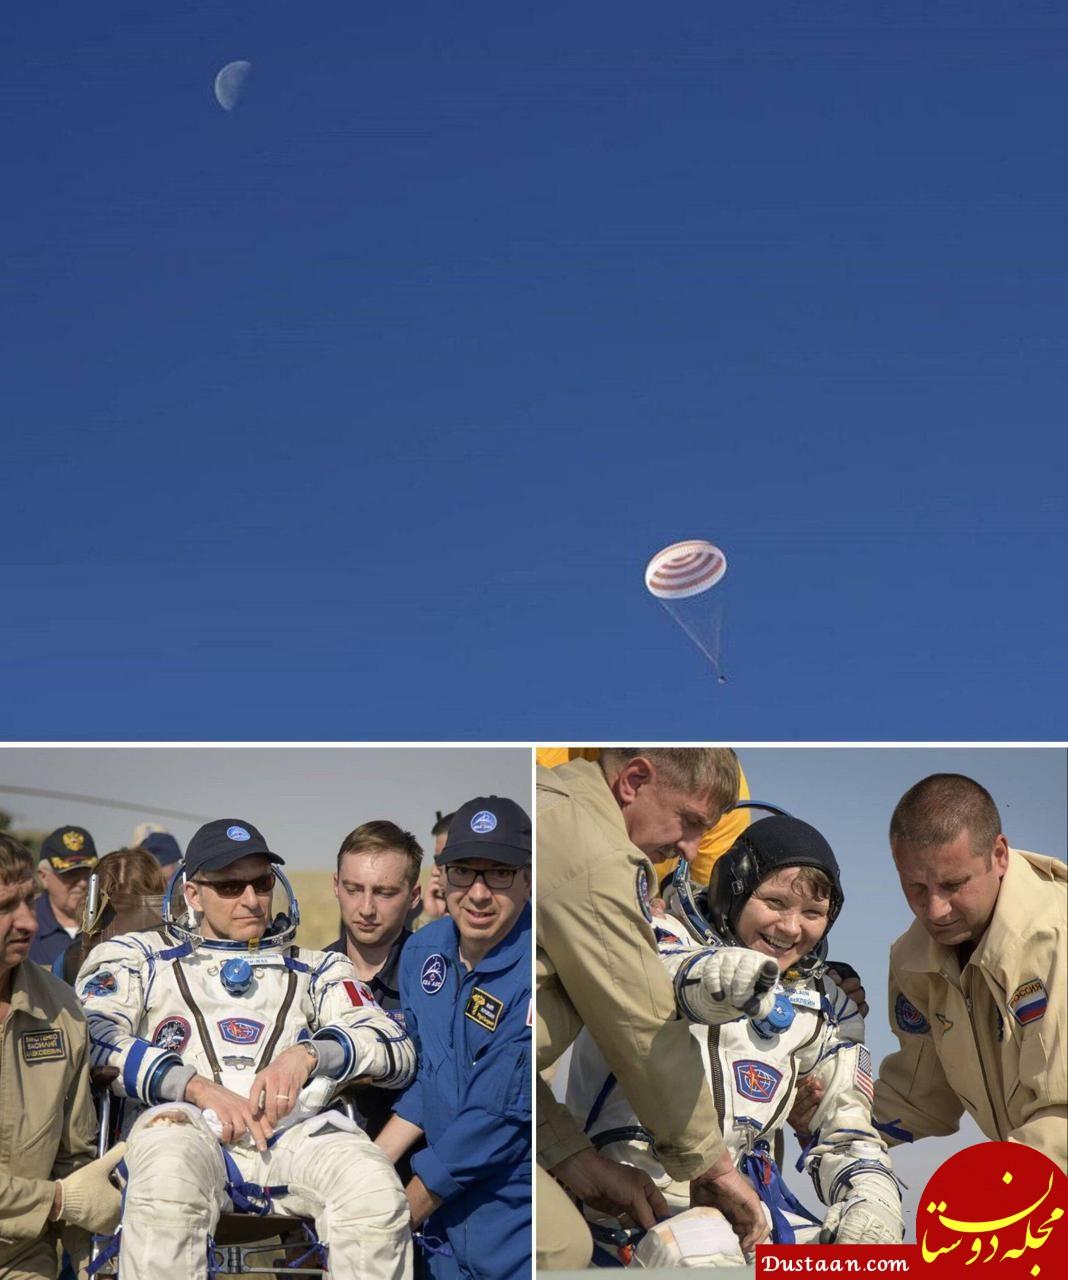 www.dustaan.com تصاویر بازگشت ۳ فضانورد به زمین